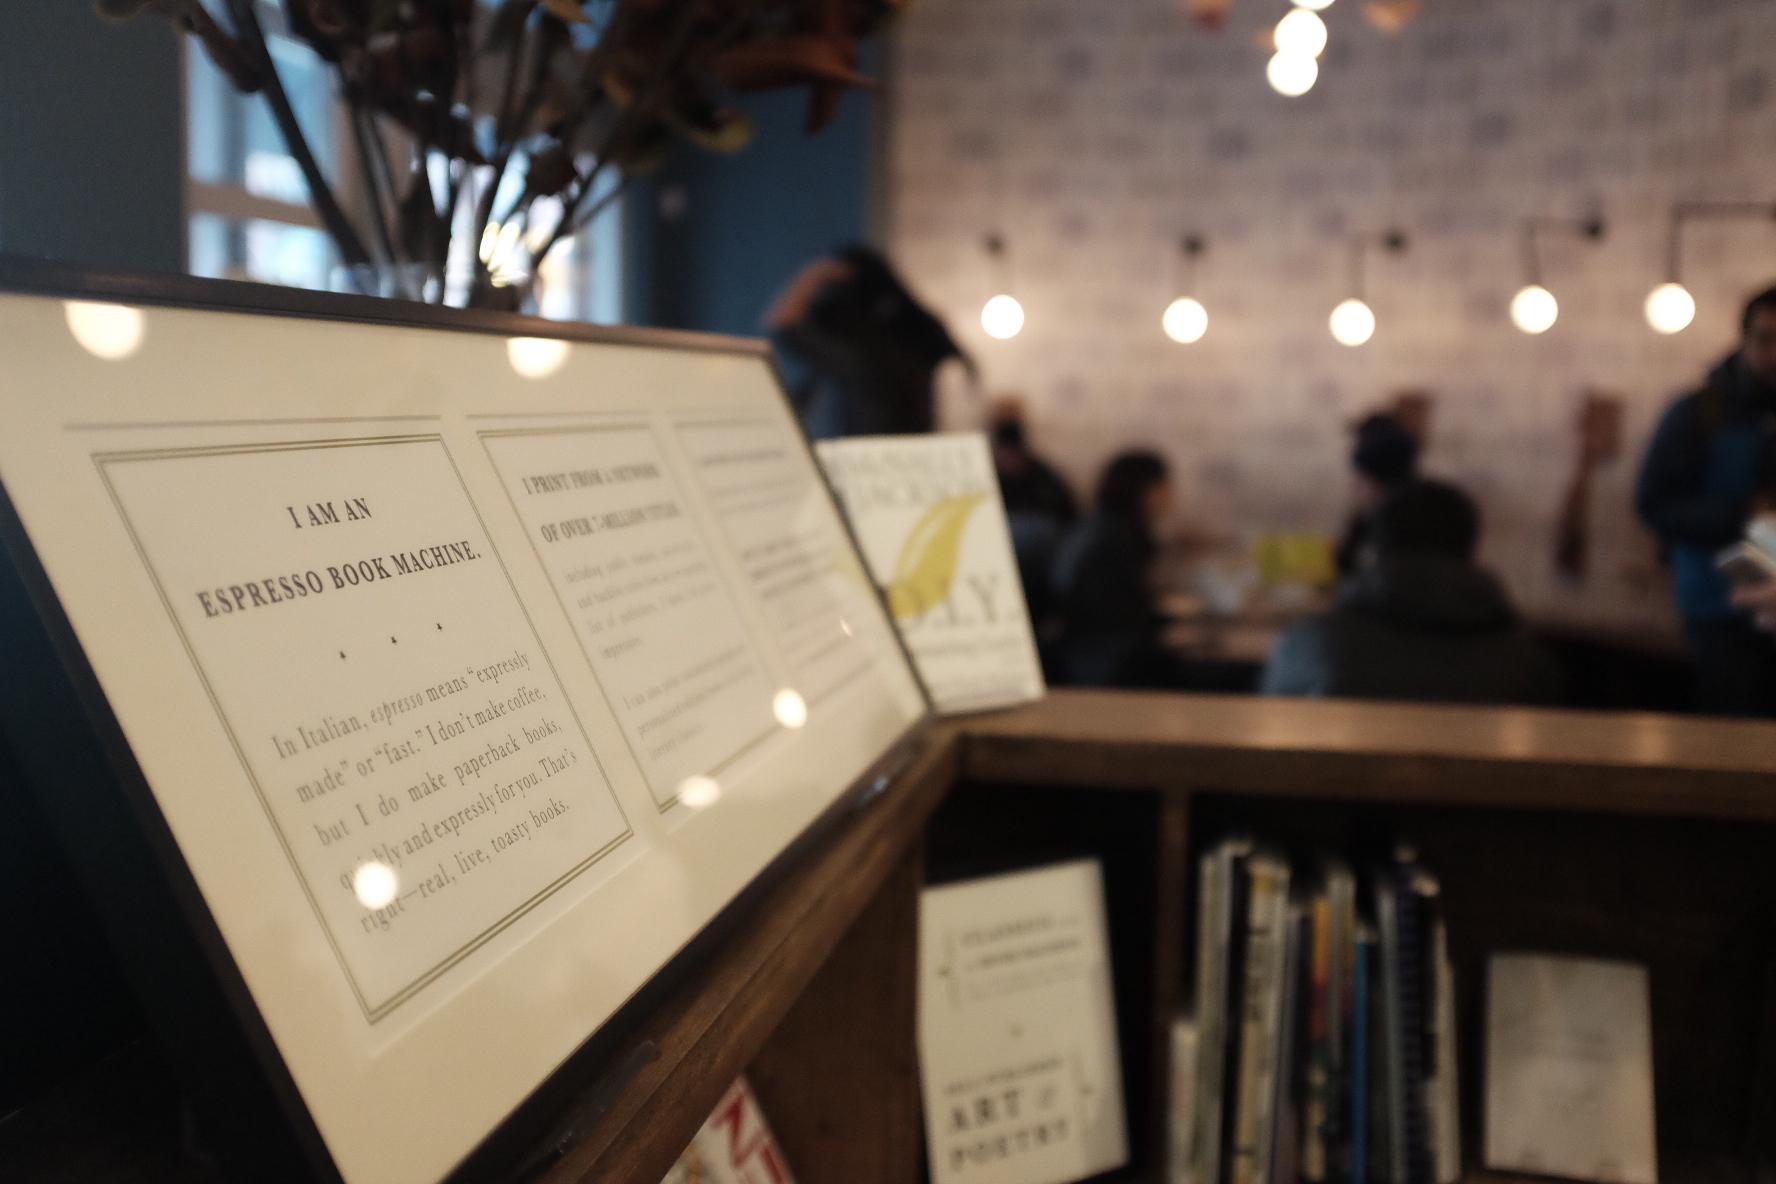 Espresso Book Machine at McNally Jackson Books   Photo: Jinglu Huang